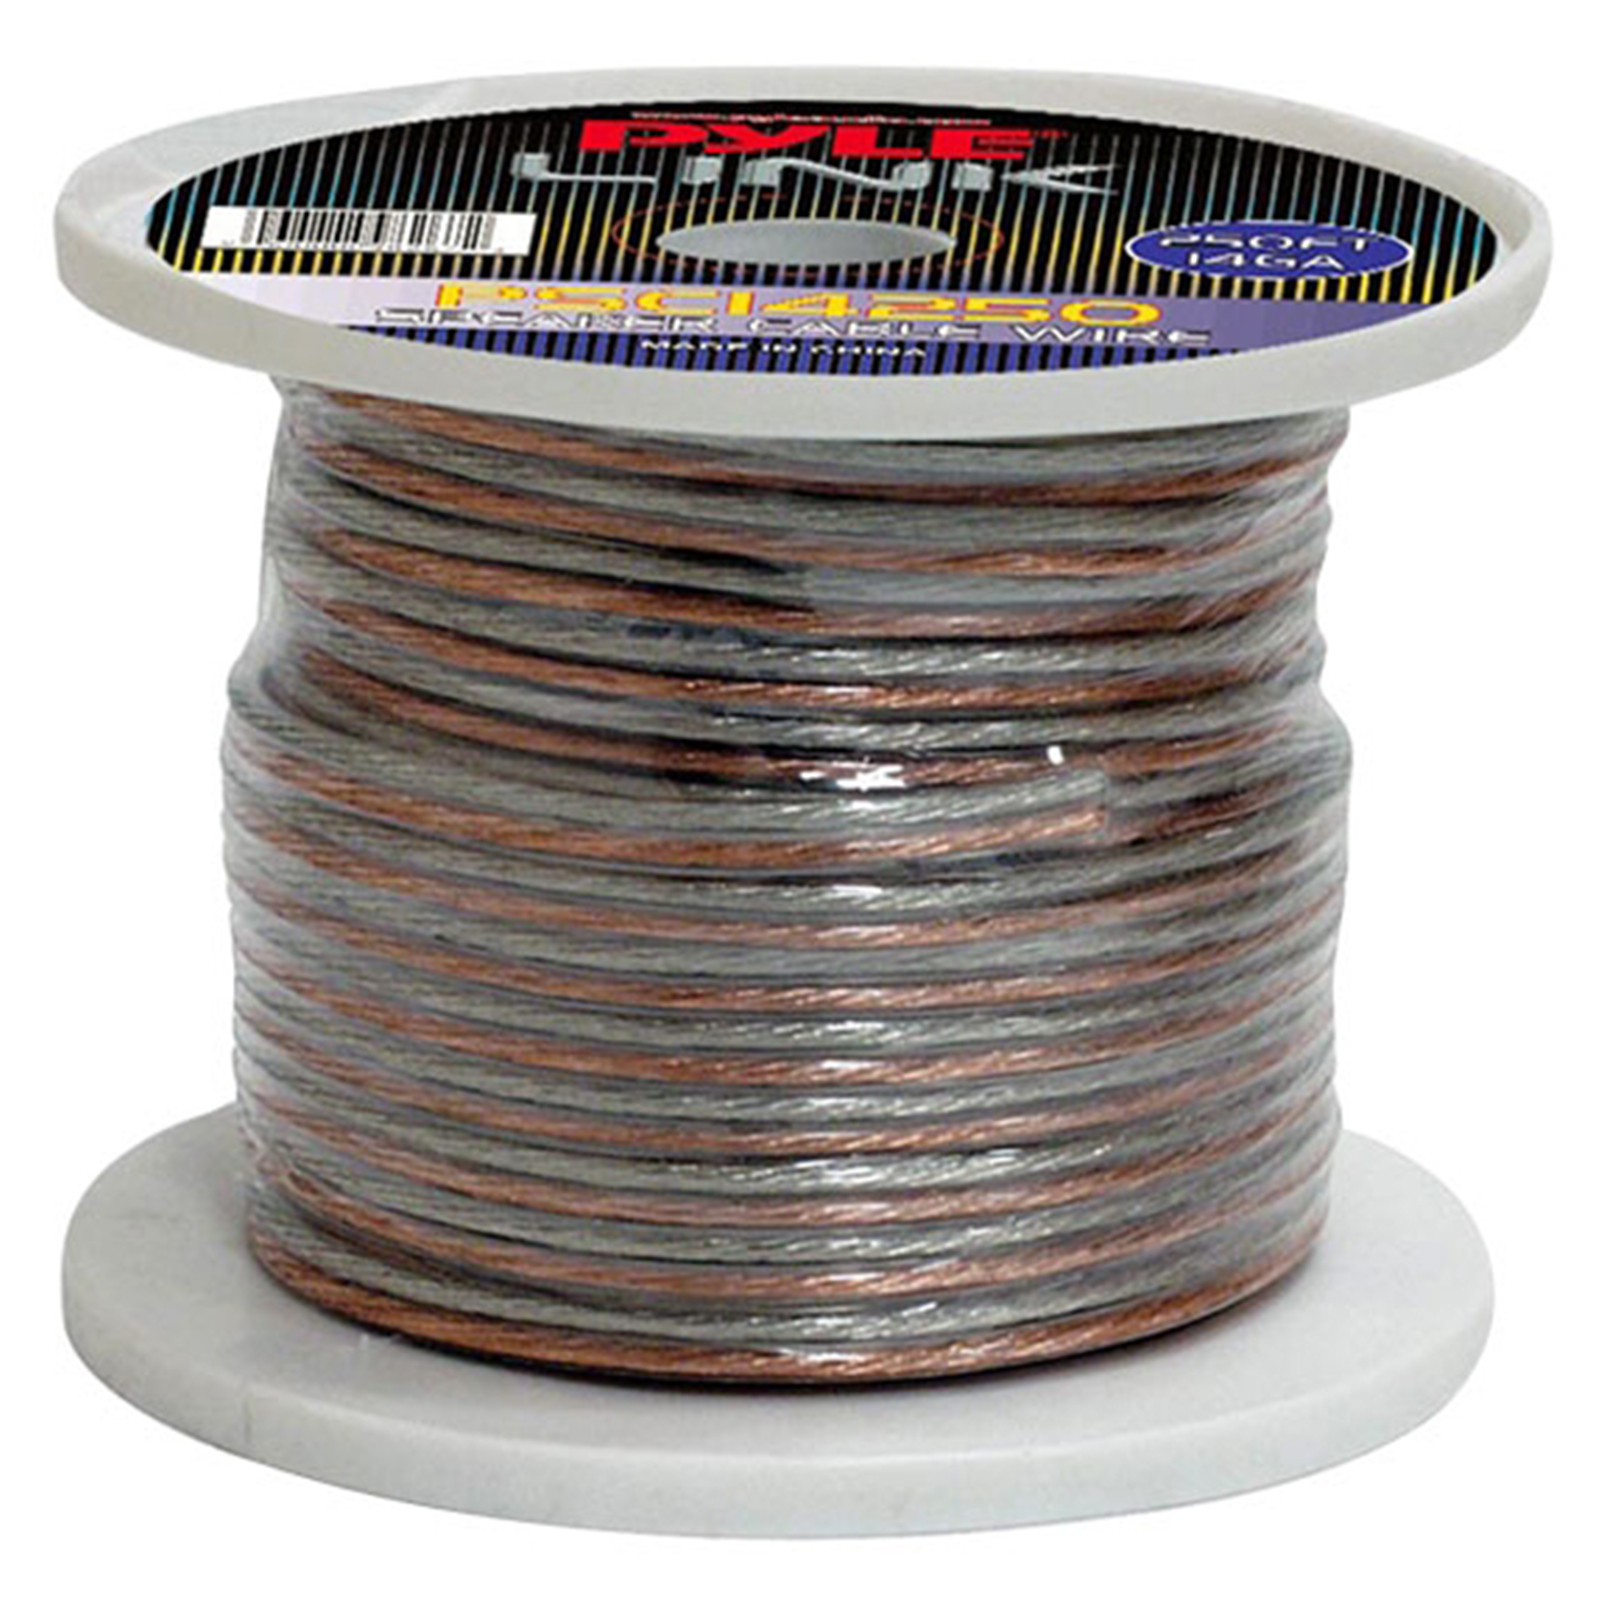 Pyle PSC14250 14-Gauge 250 feet Spool of Speaker Zip Wire